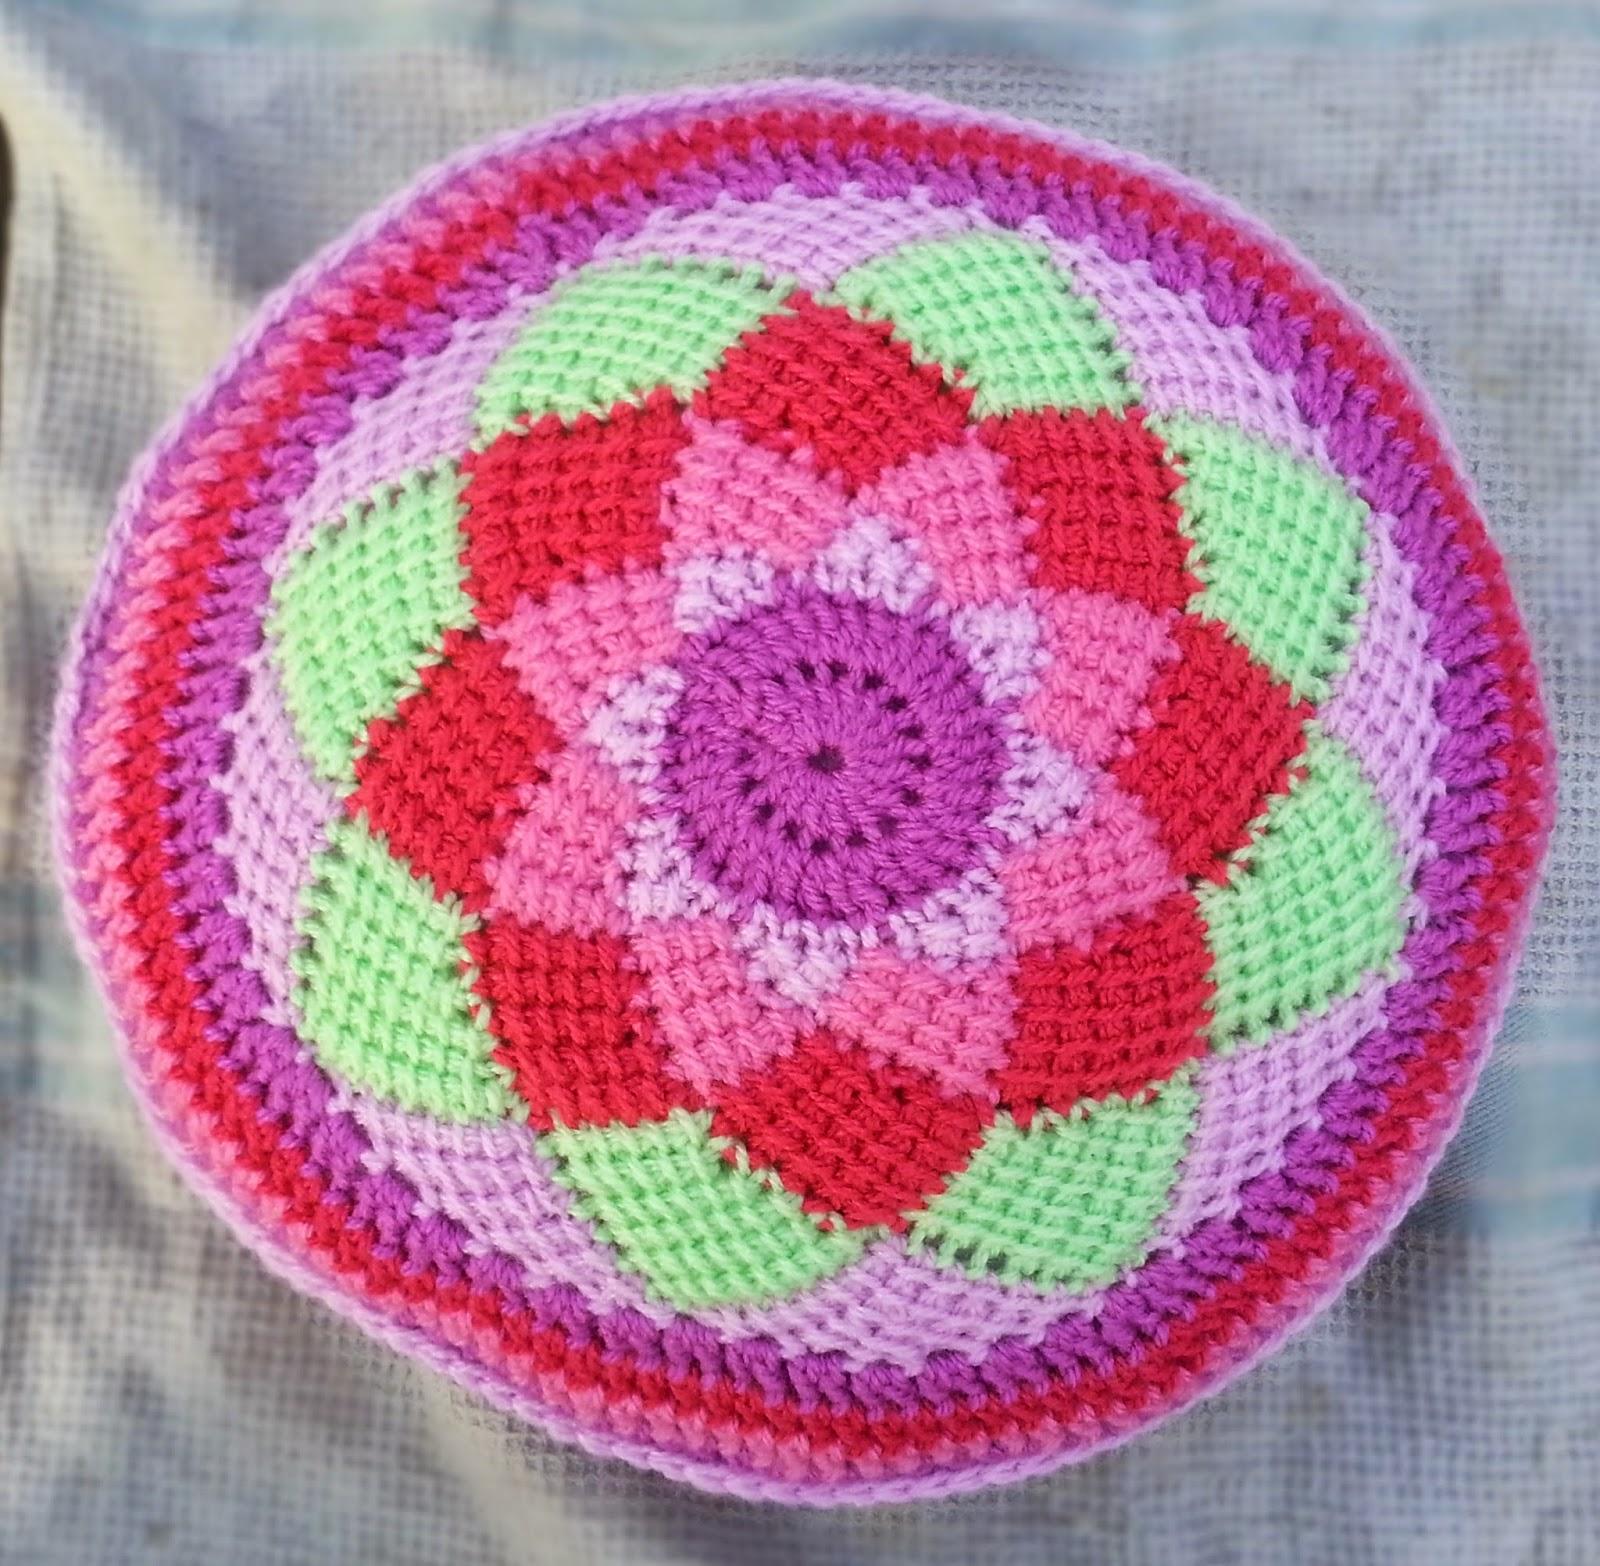 Tunisian Crochet Pattern Maker : Hooking Crazy: Tunisian Entrelac Circle Cushion